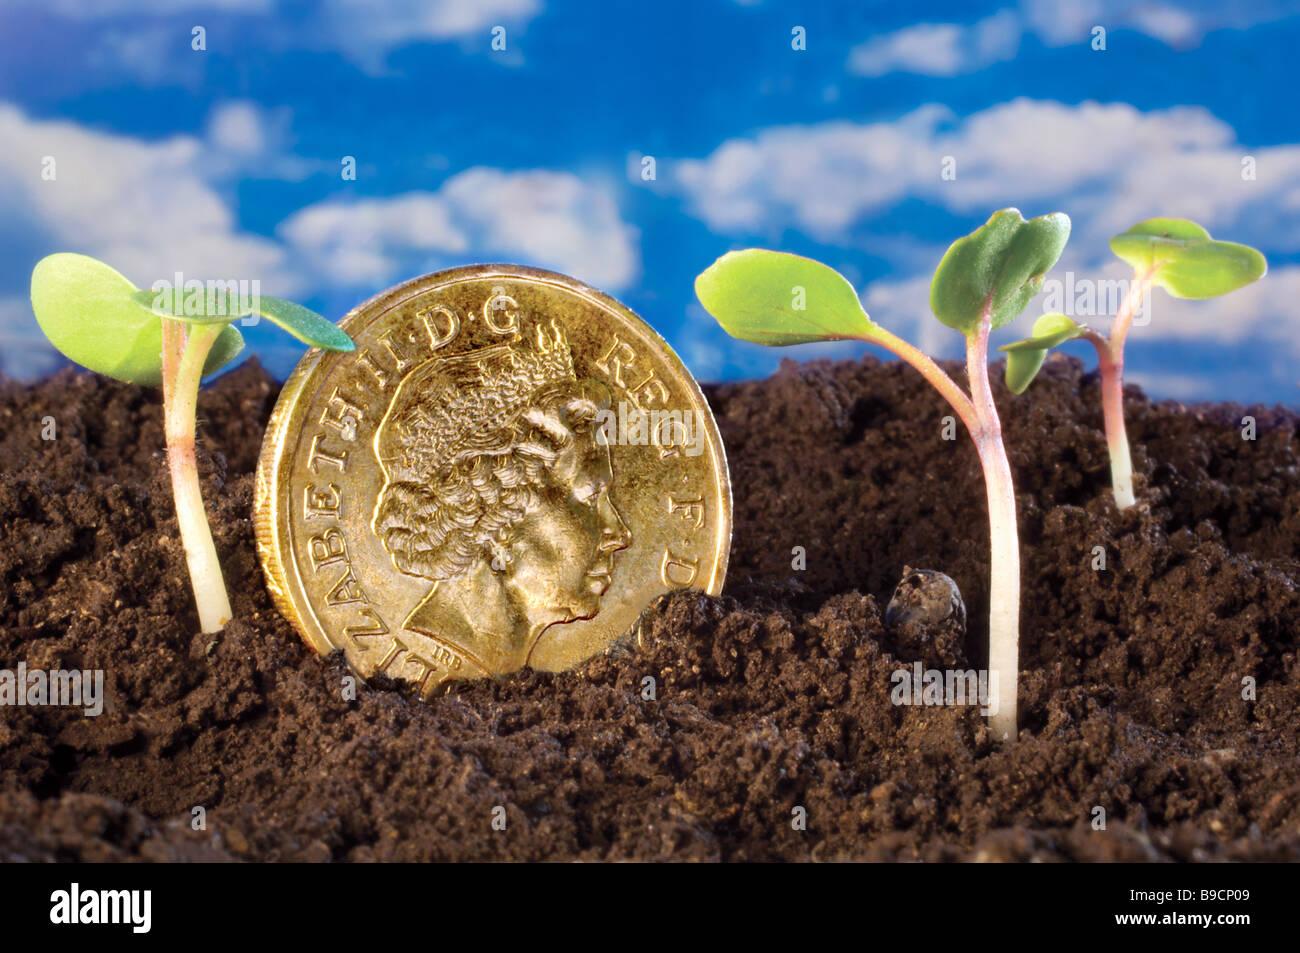 green shoots recovery UK Pound economy economic growth - Stock Image